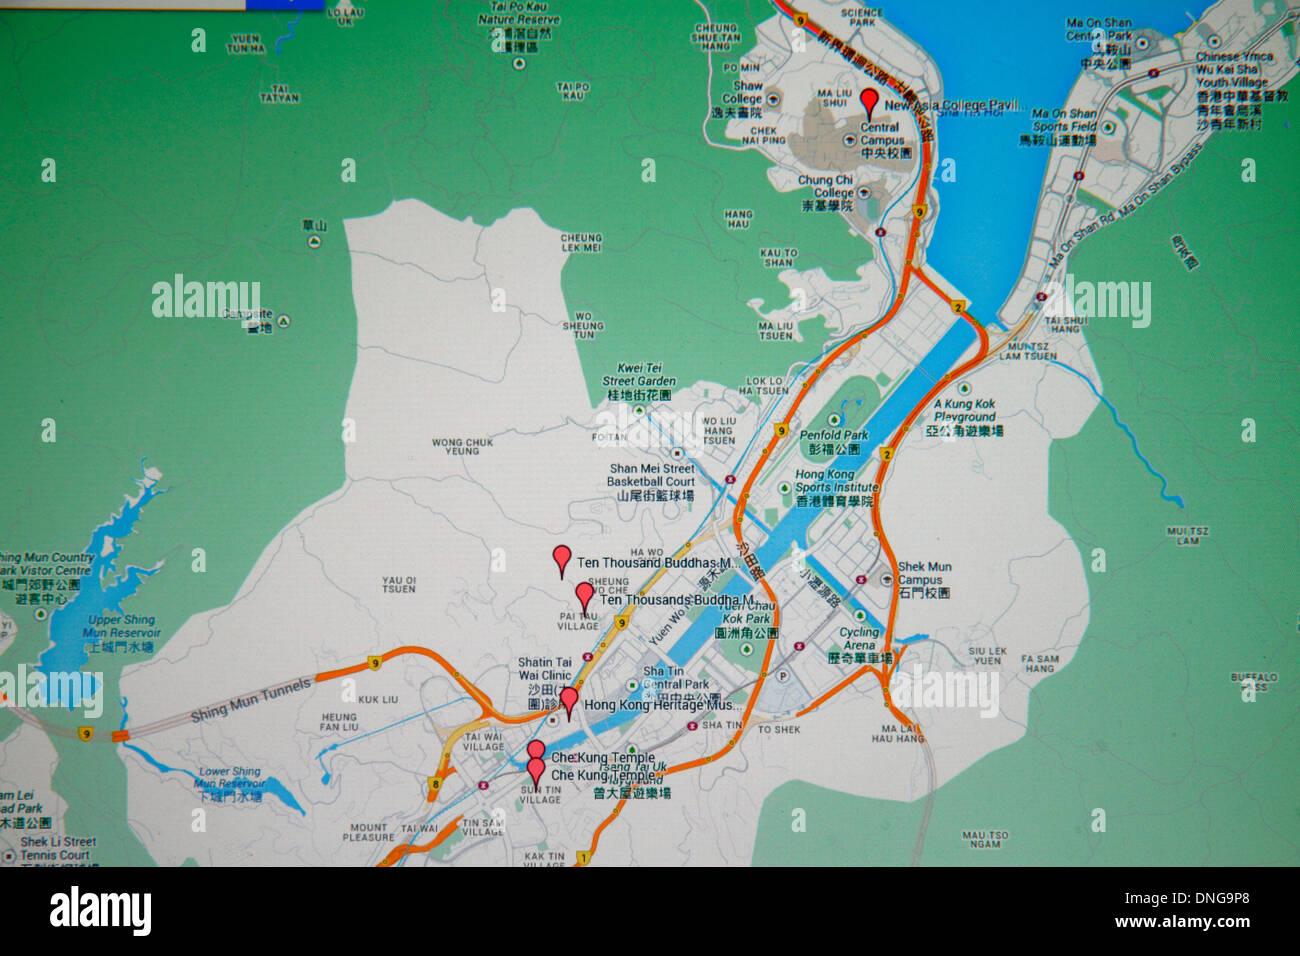 Hong kong china sha tin google map online red tags street computer hong kong china sha tin google map online red tags street computer monitor cantonese chinese characters hnz pinyin gumiabroncs Gallery